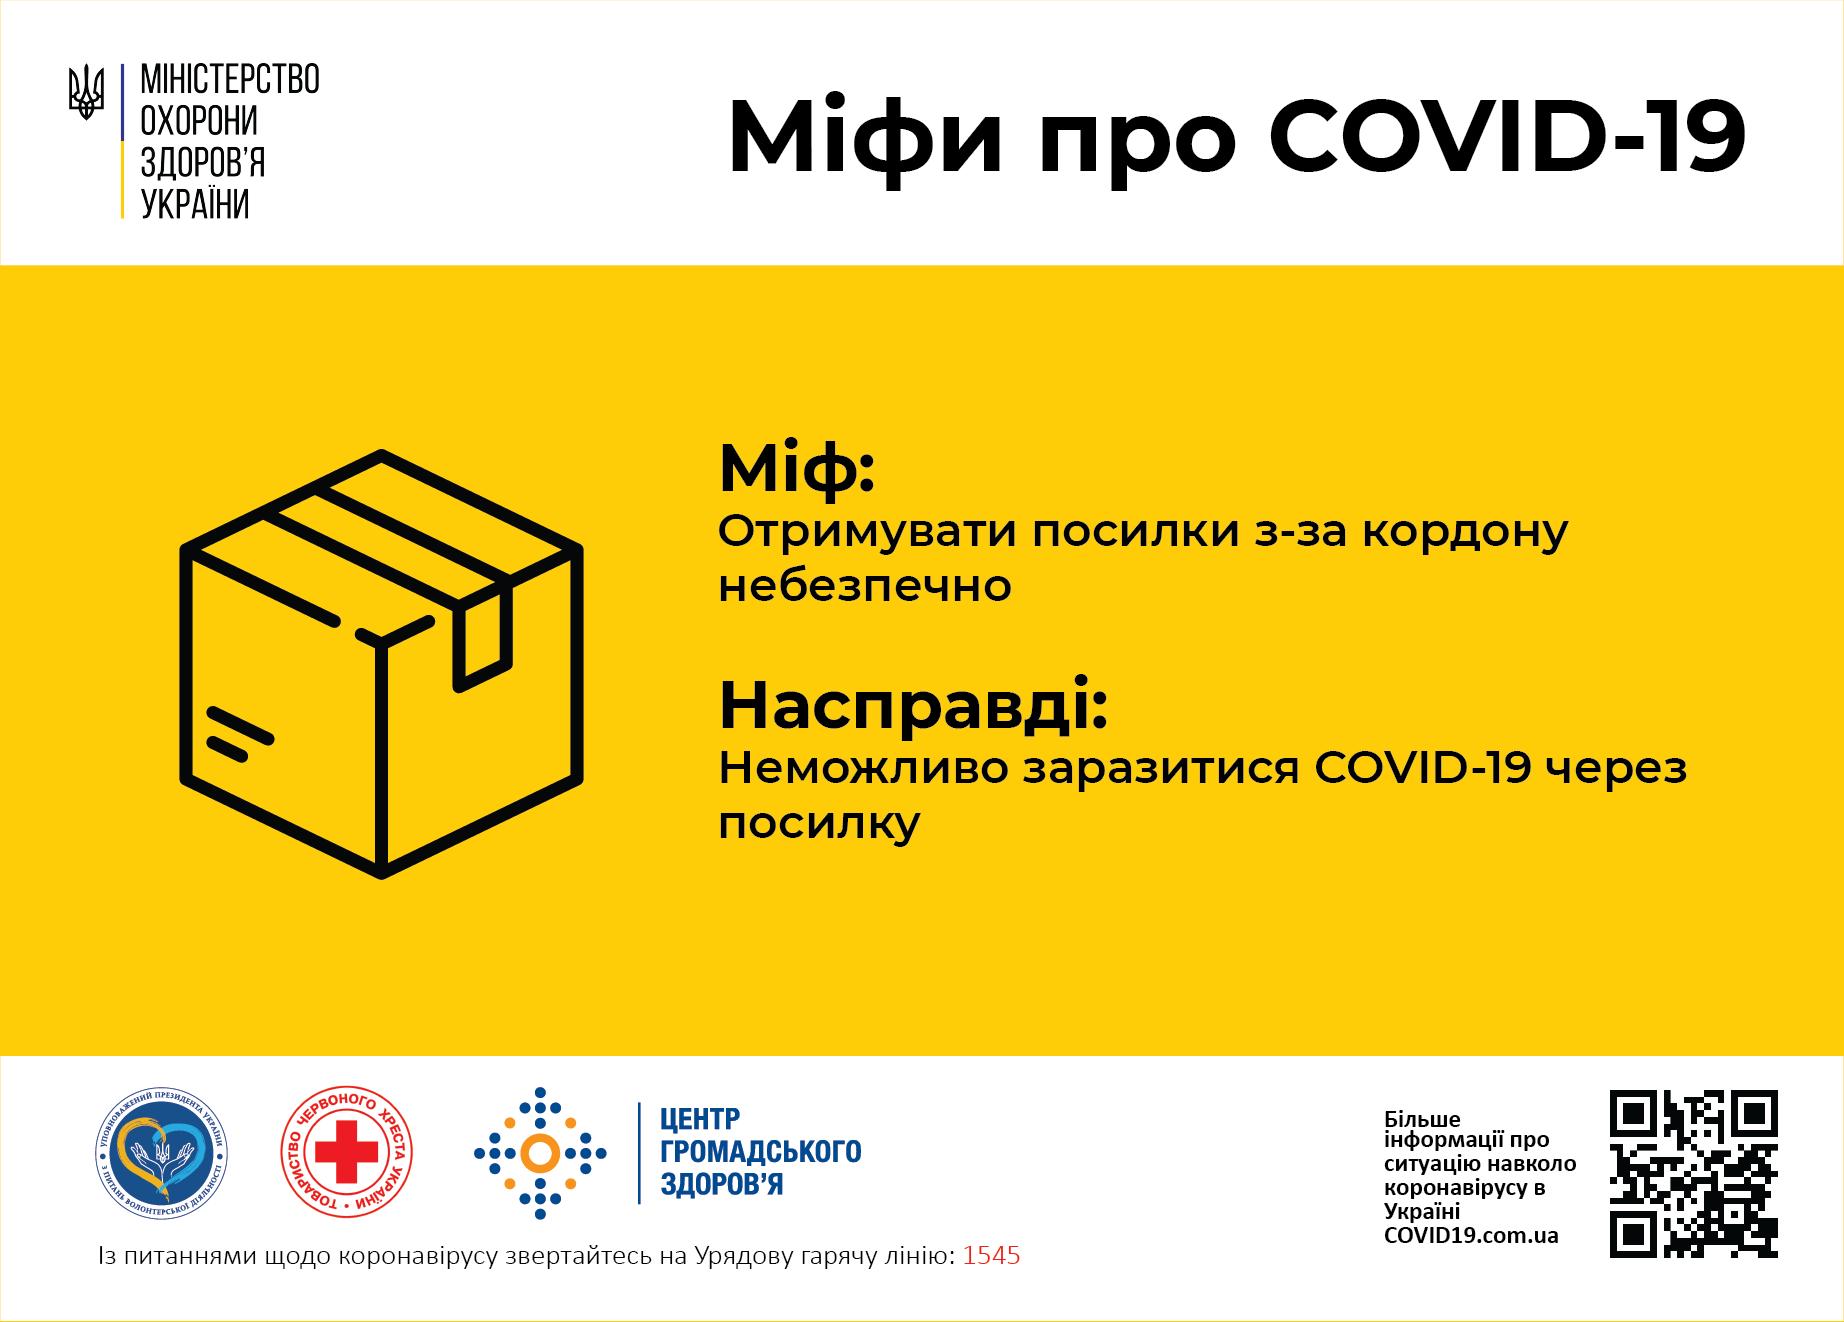 Можно ли заразиться коронавирусом через посылку из Китая